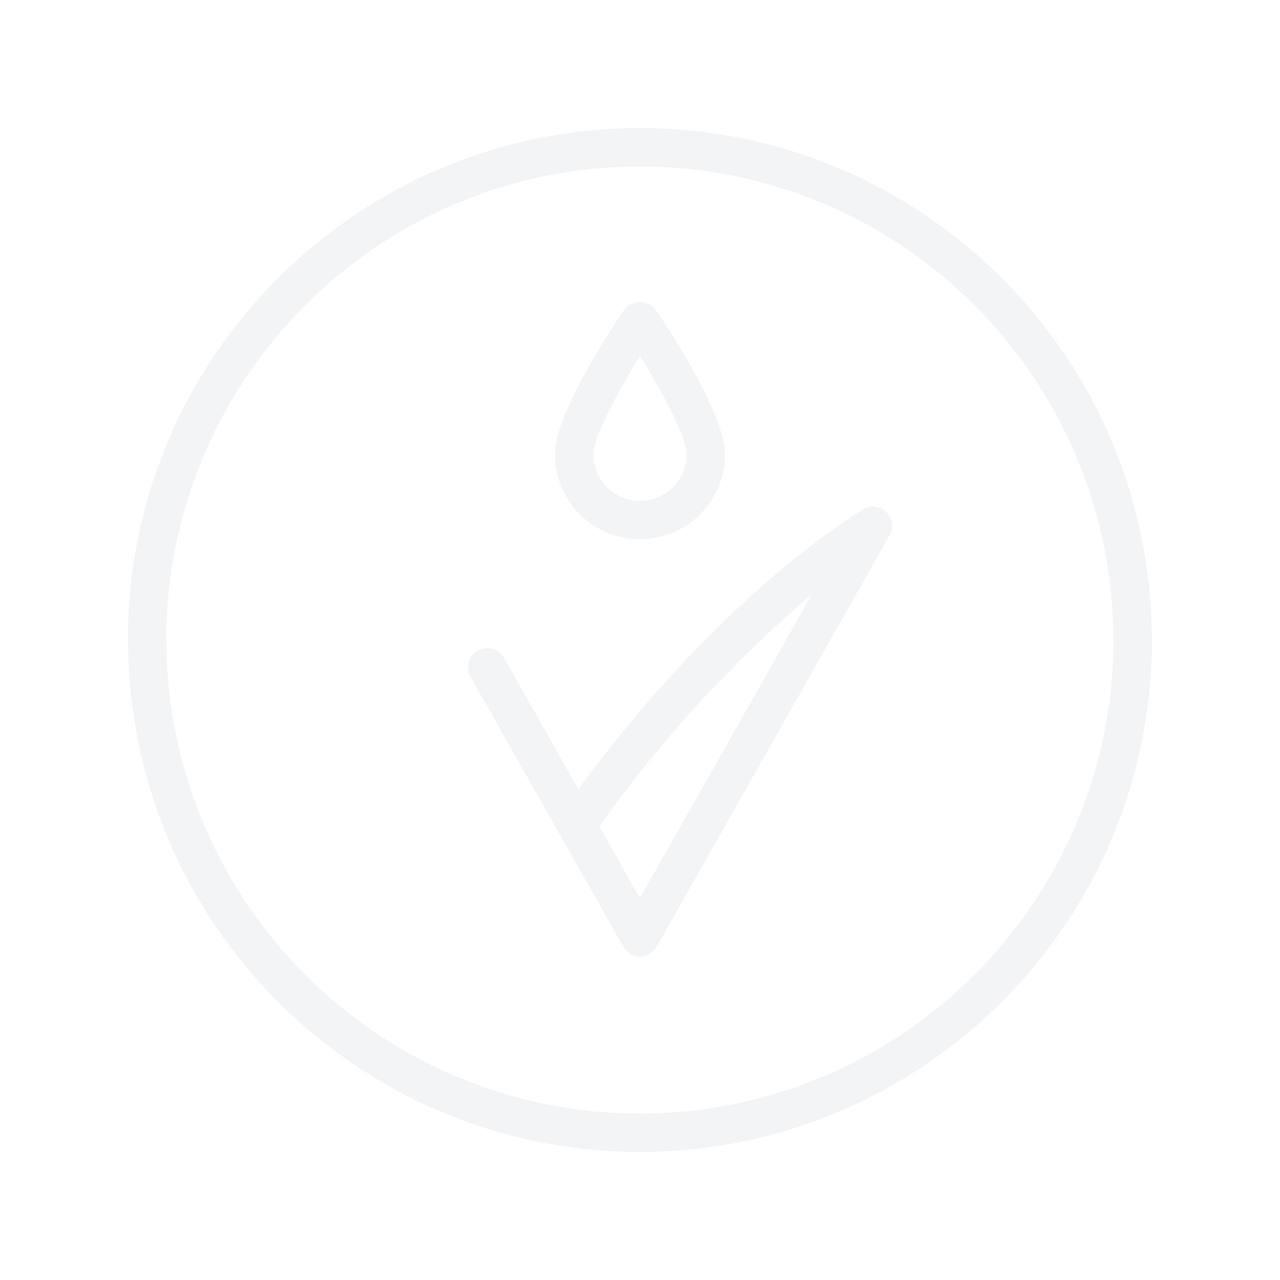 BIOKAP Nutricolor Delicato 4.0 Permanent Hair Dye 140ml